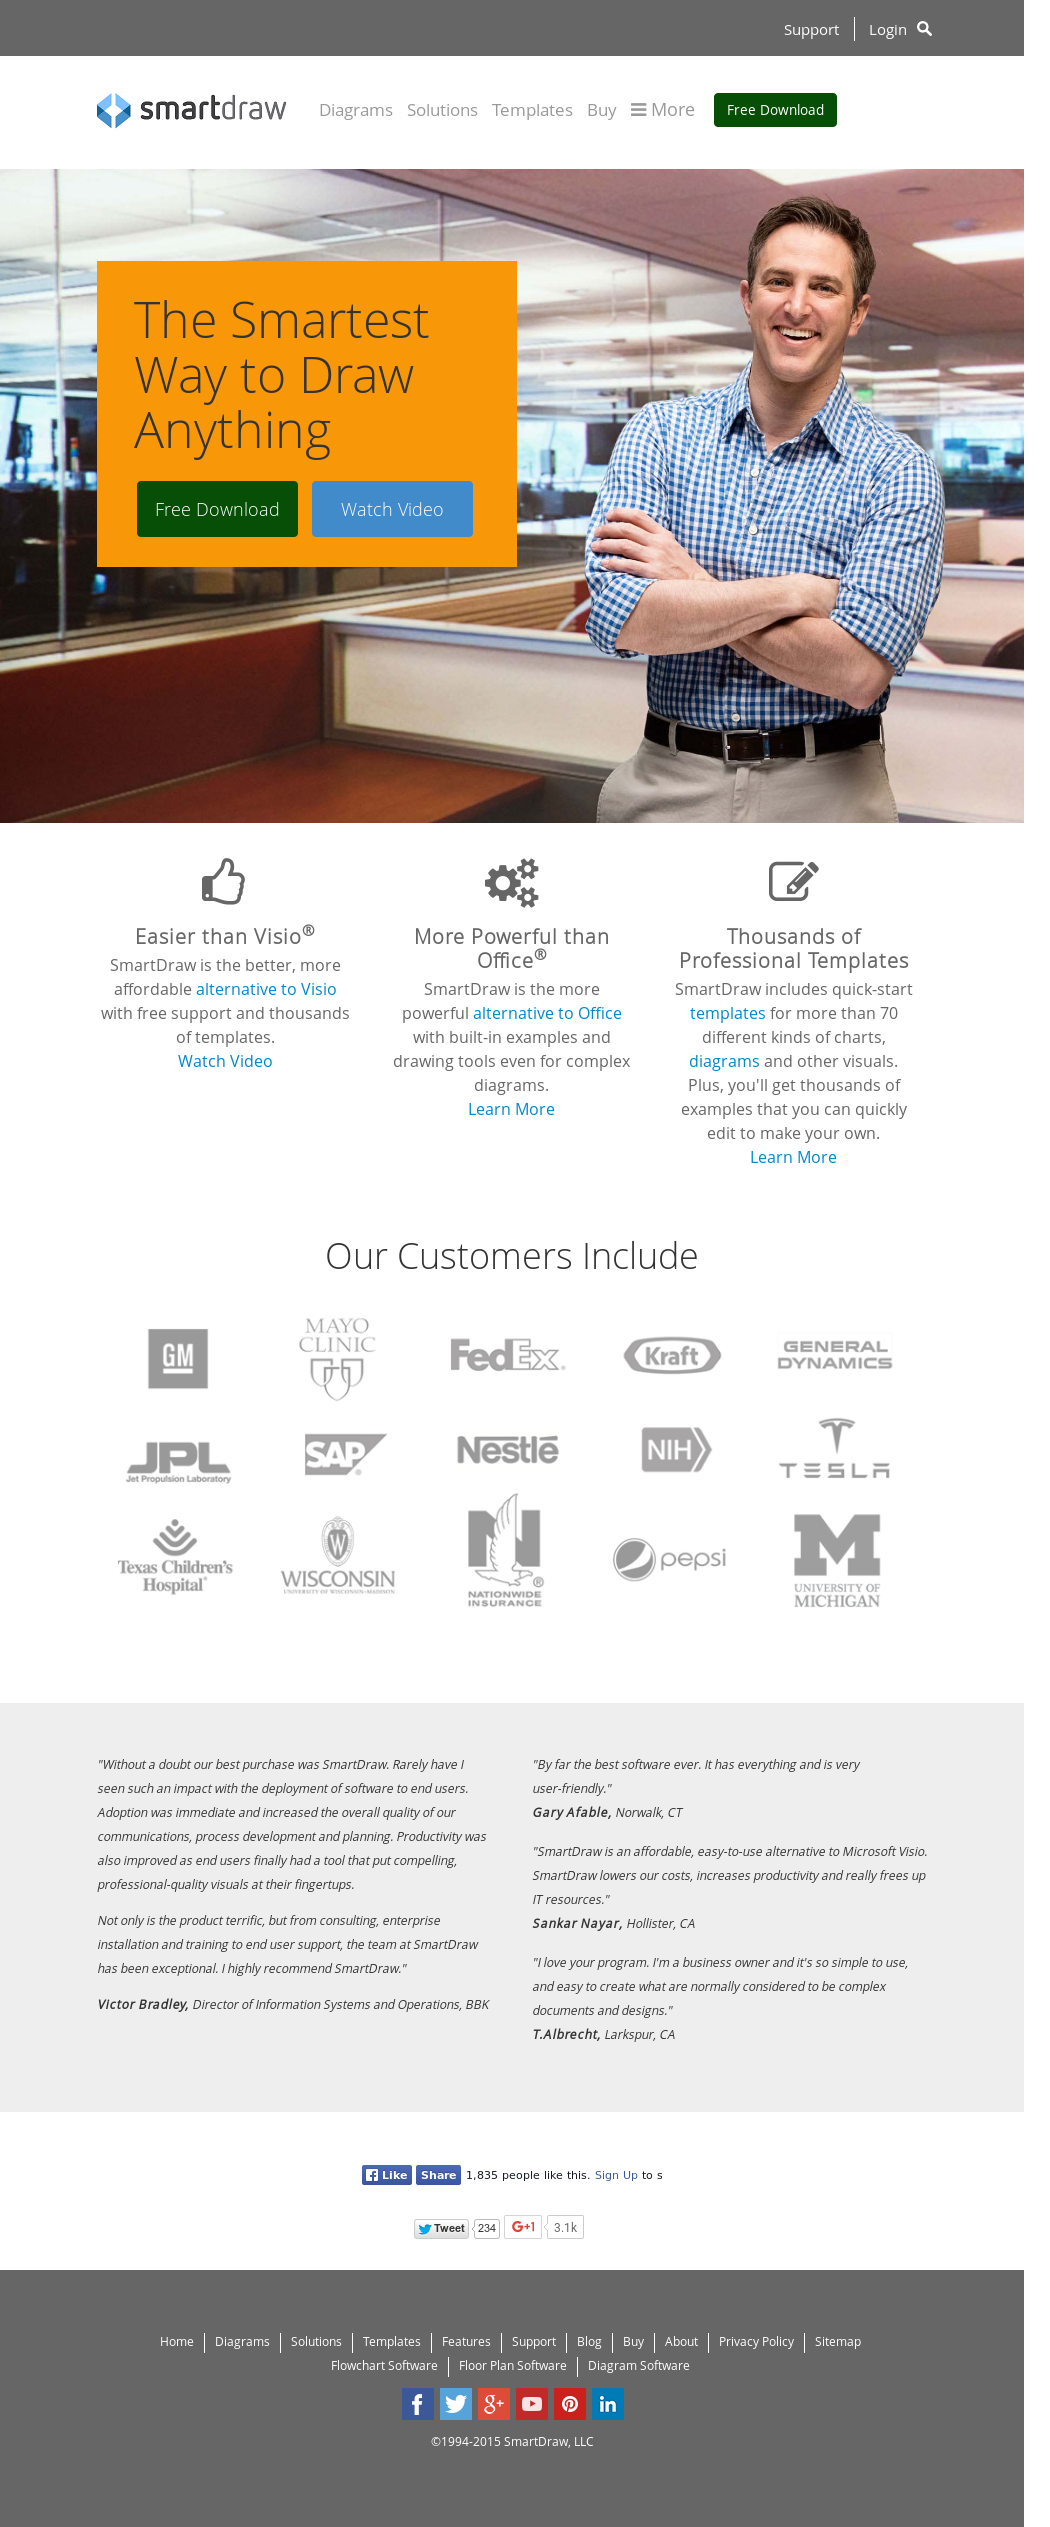 smartdraw 2016 free download full version